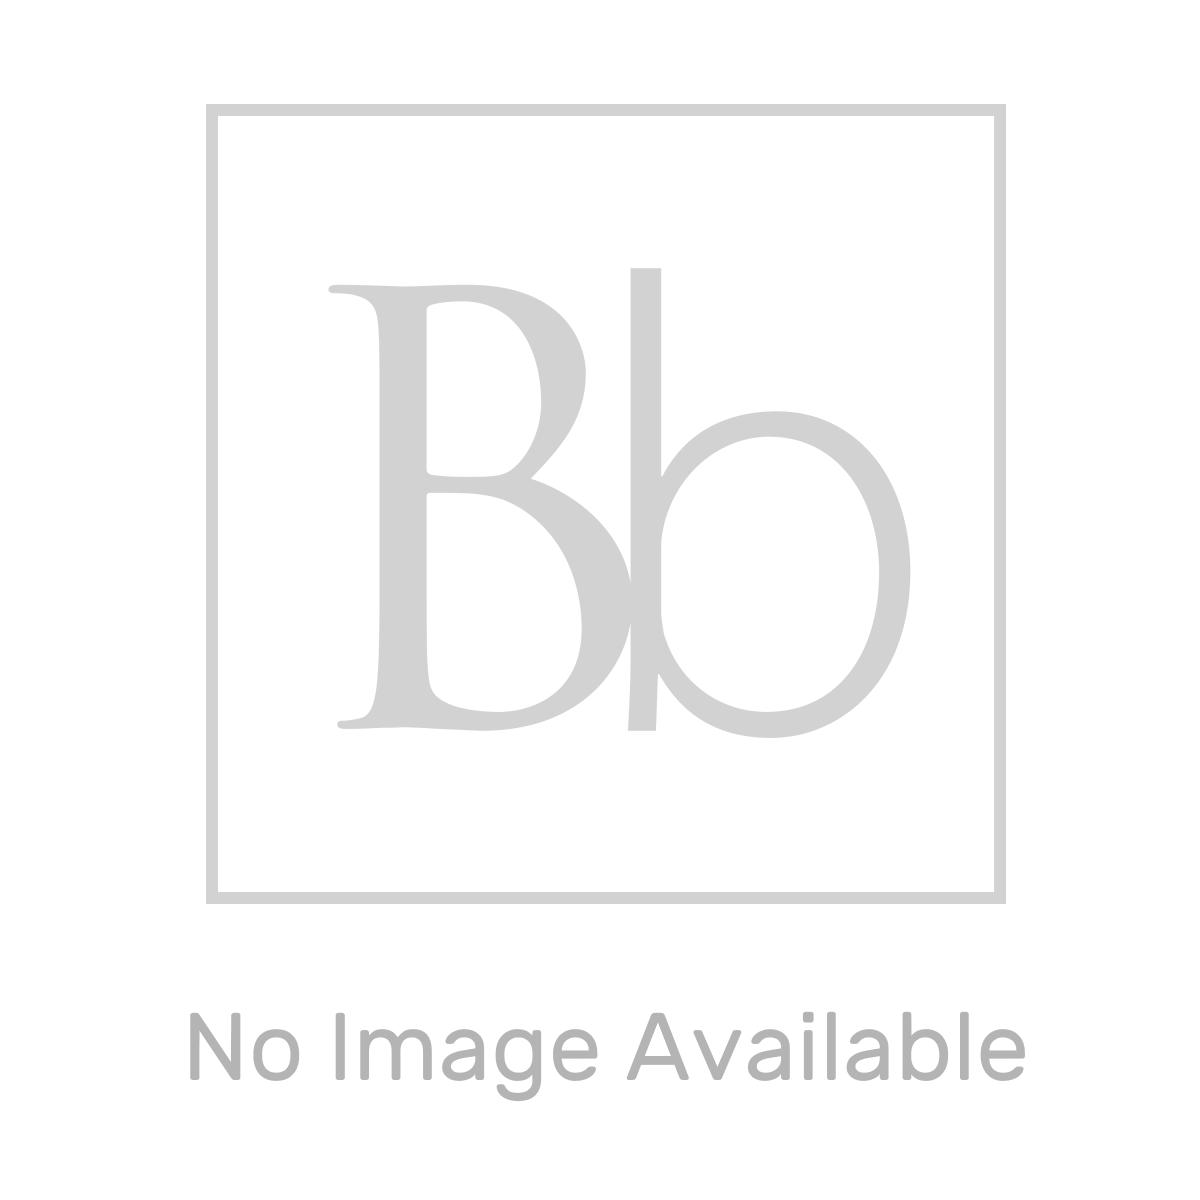 Premier Slimline Rectangular Walk In Shower Tray 1600 x 800mm